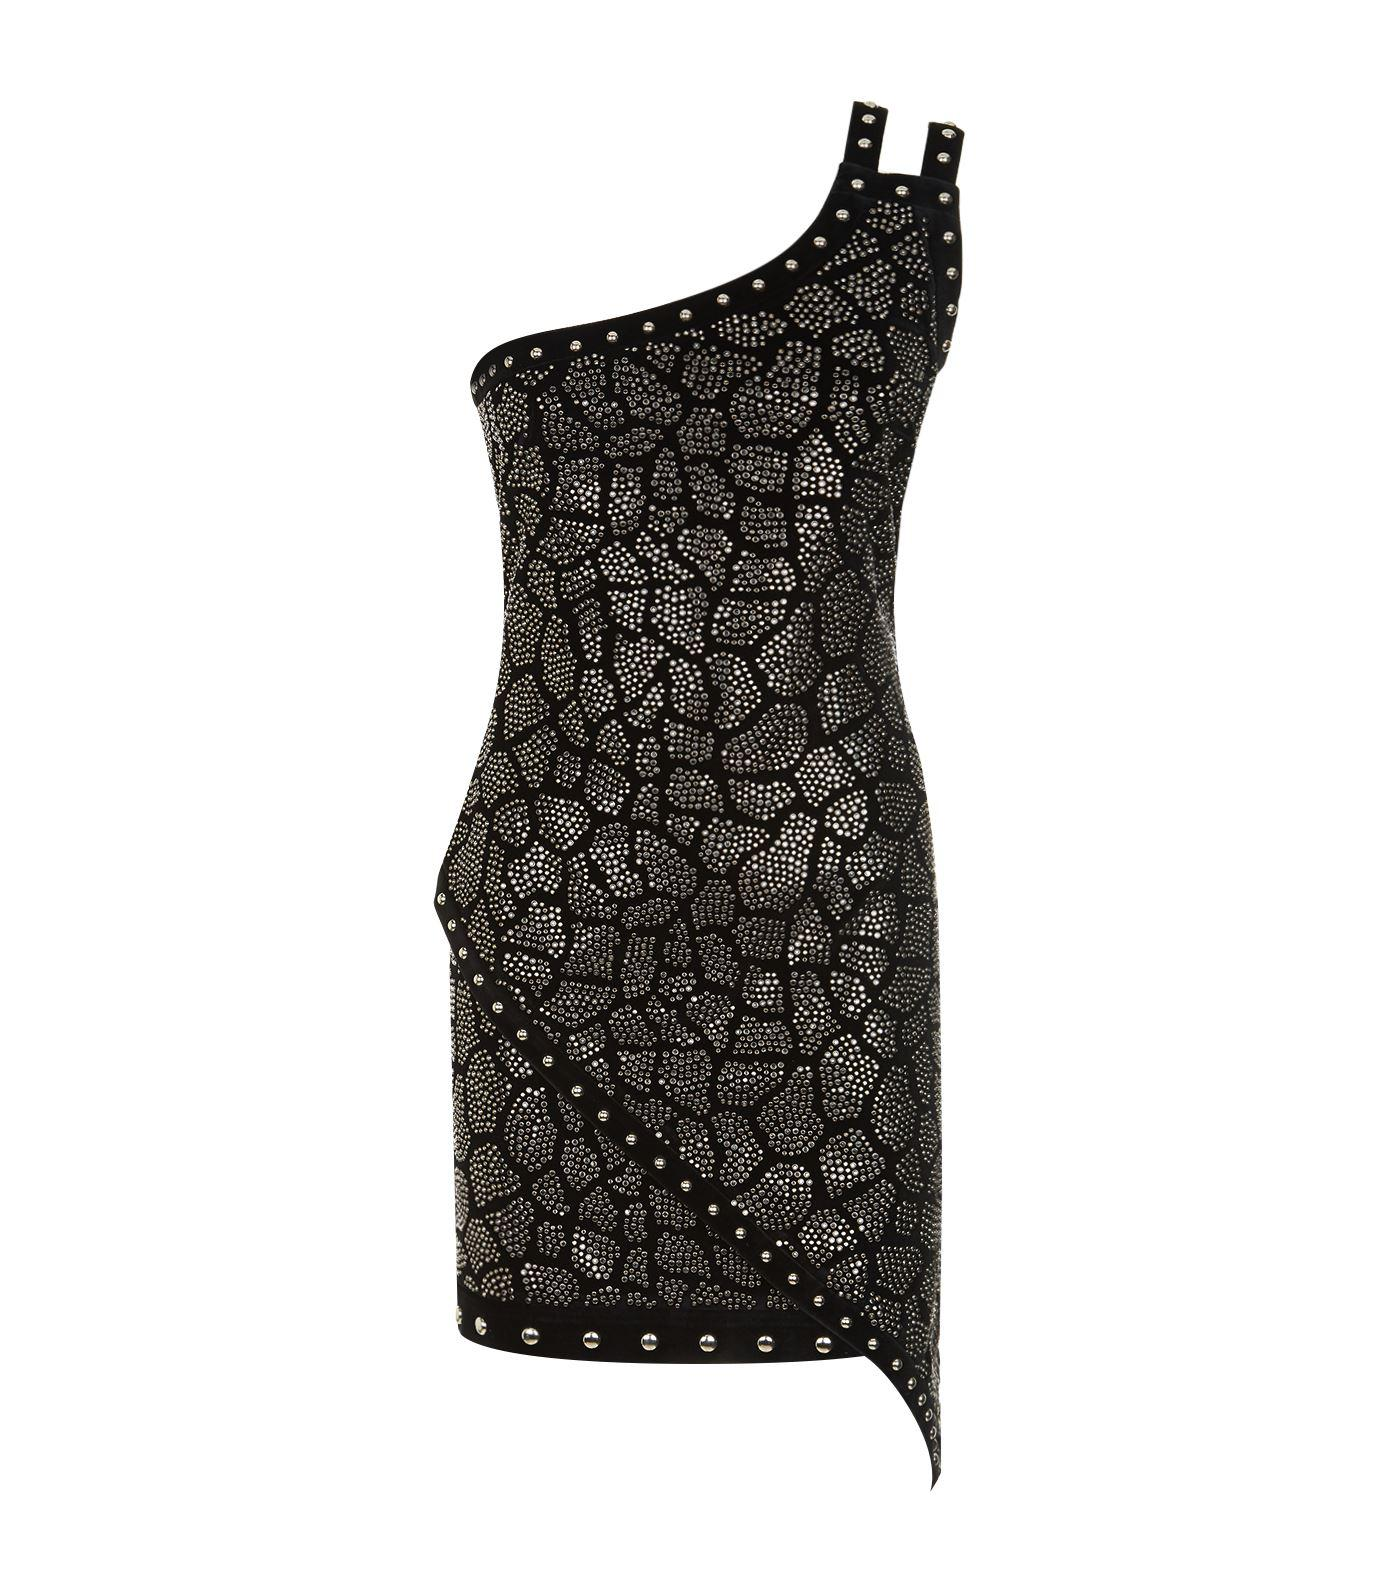 333f75e8 Lyst - Balmain Embellished One-shoulder Mini Dress in Black